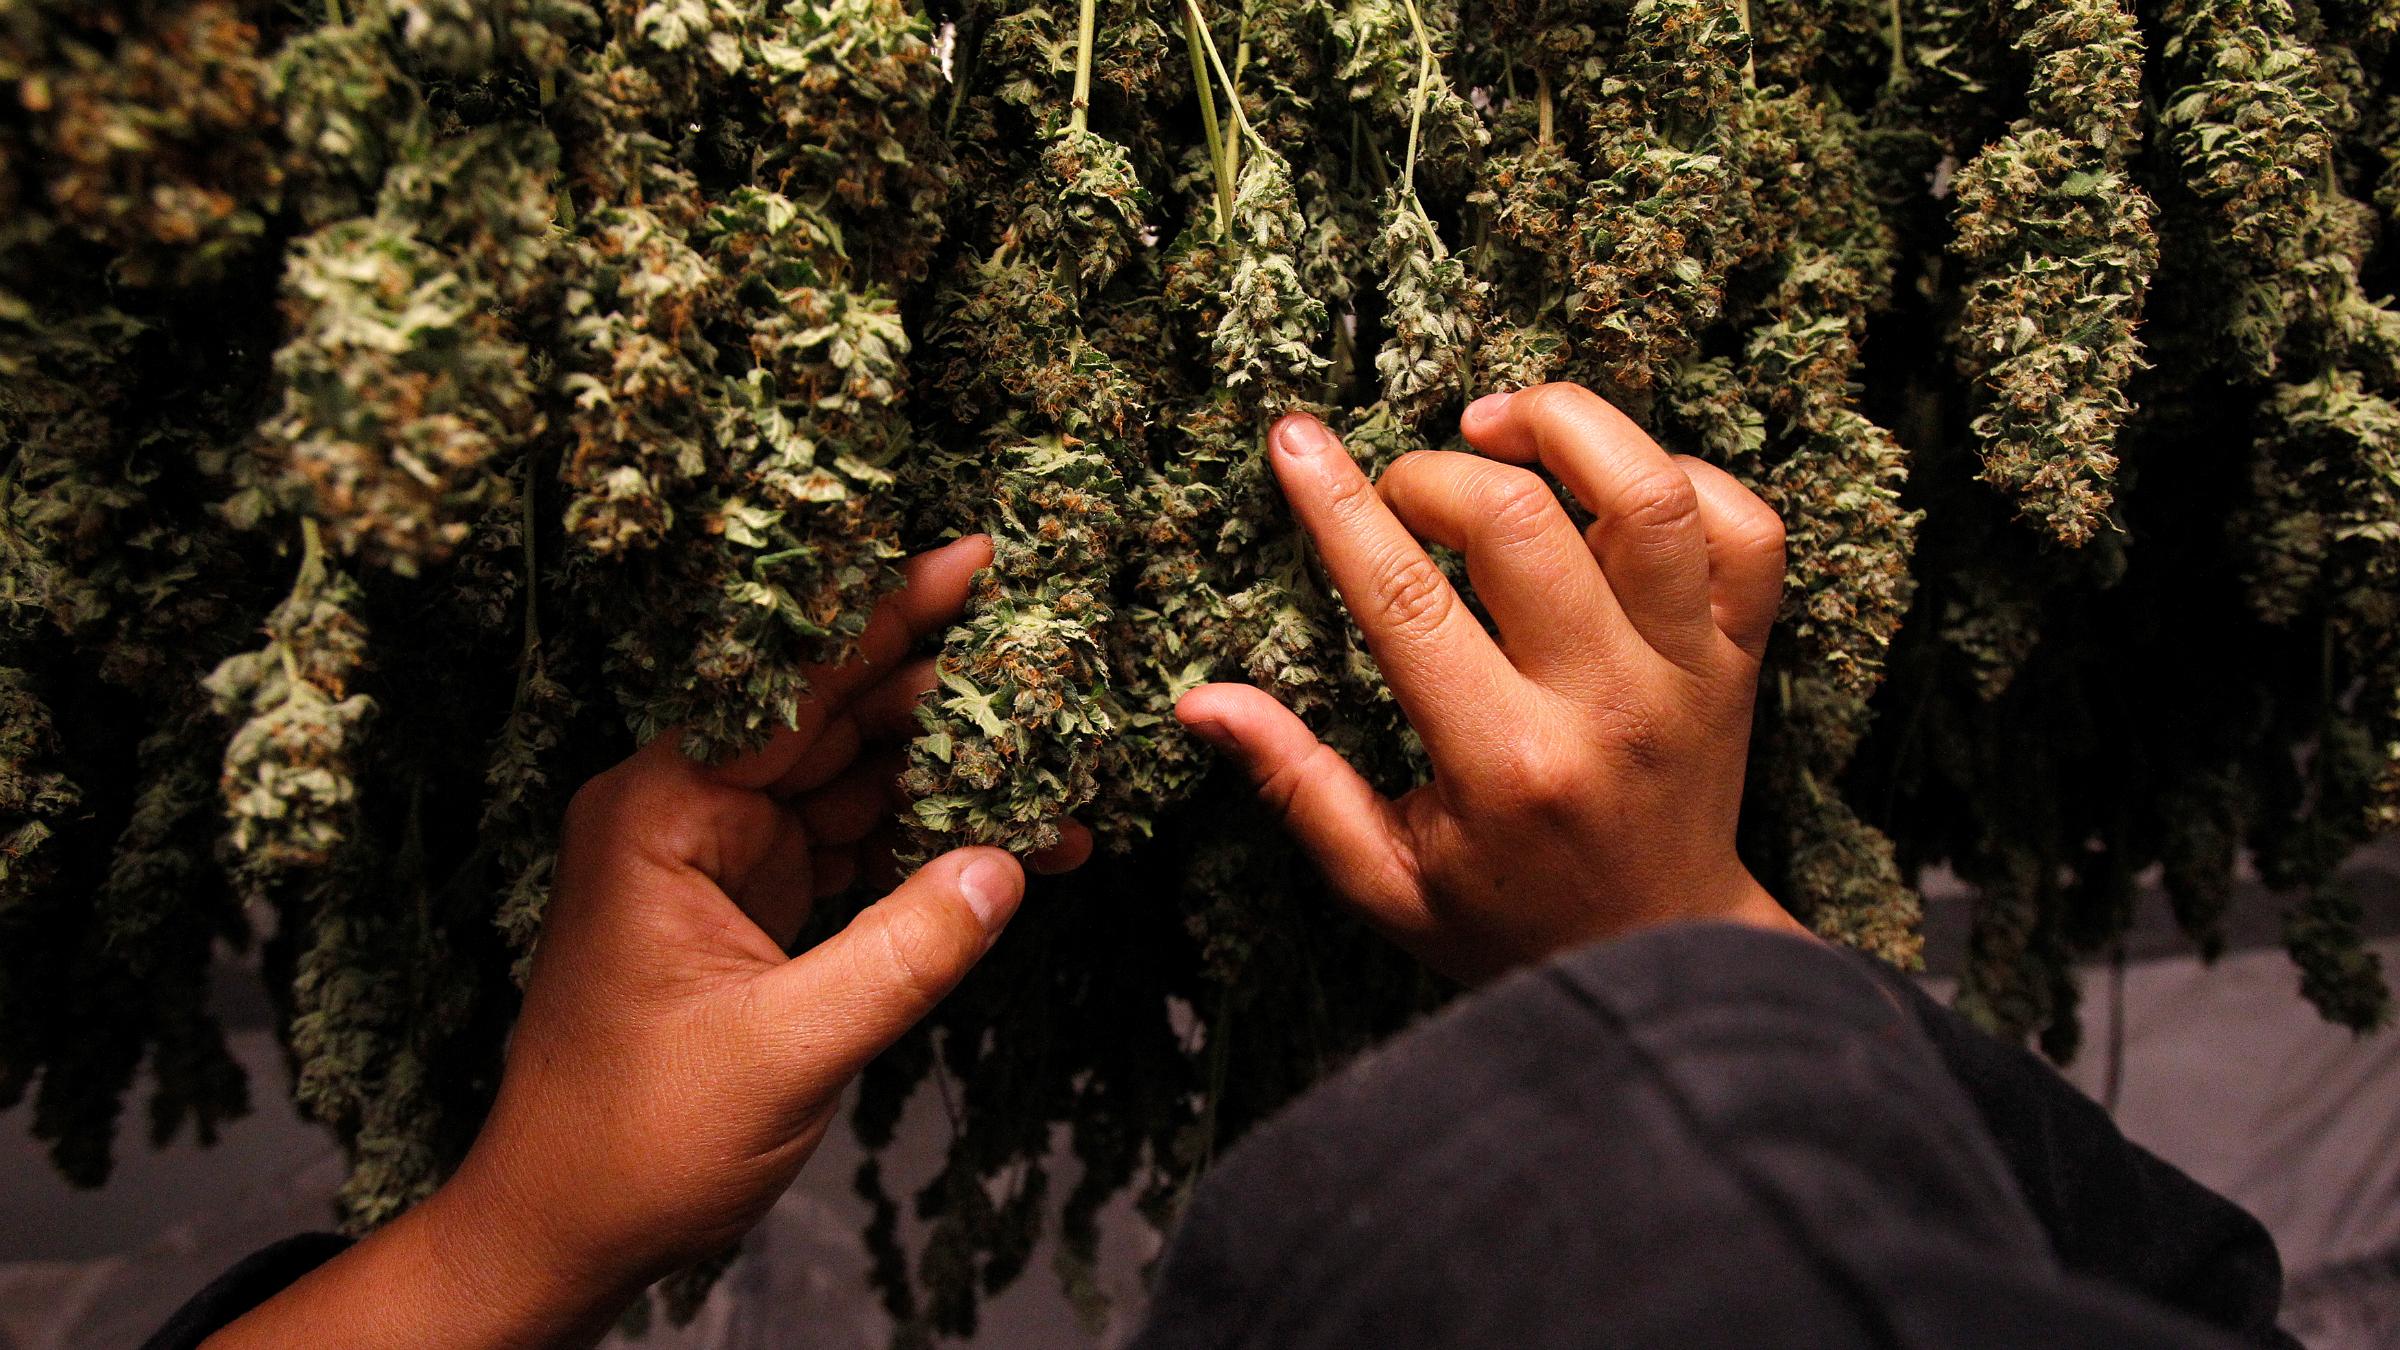 Marijuana Uruguay Paraguay